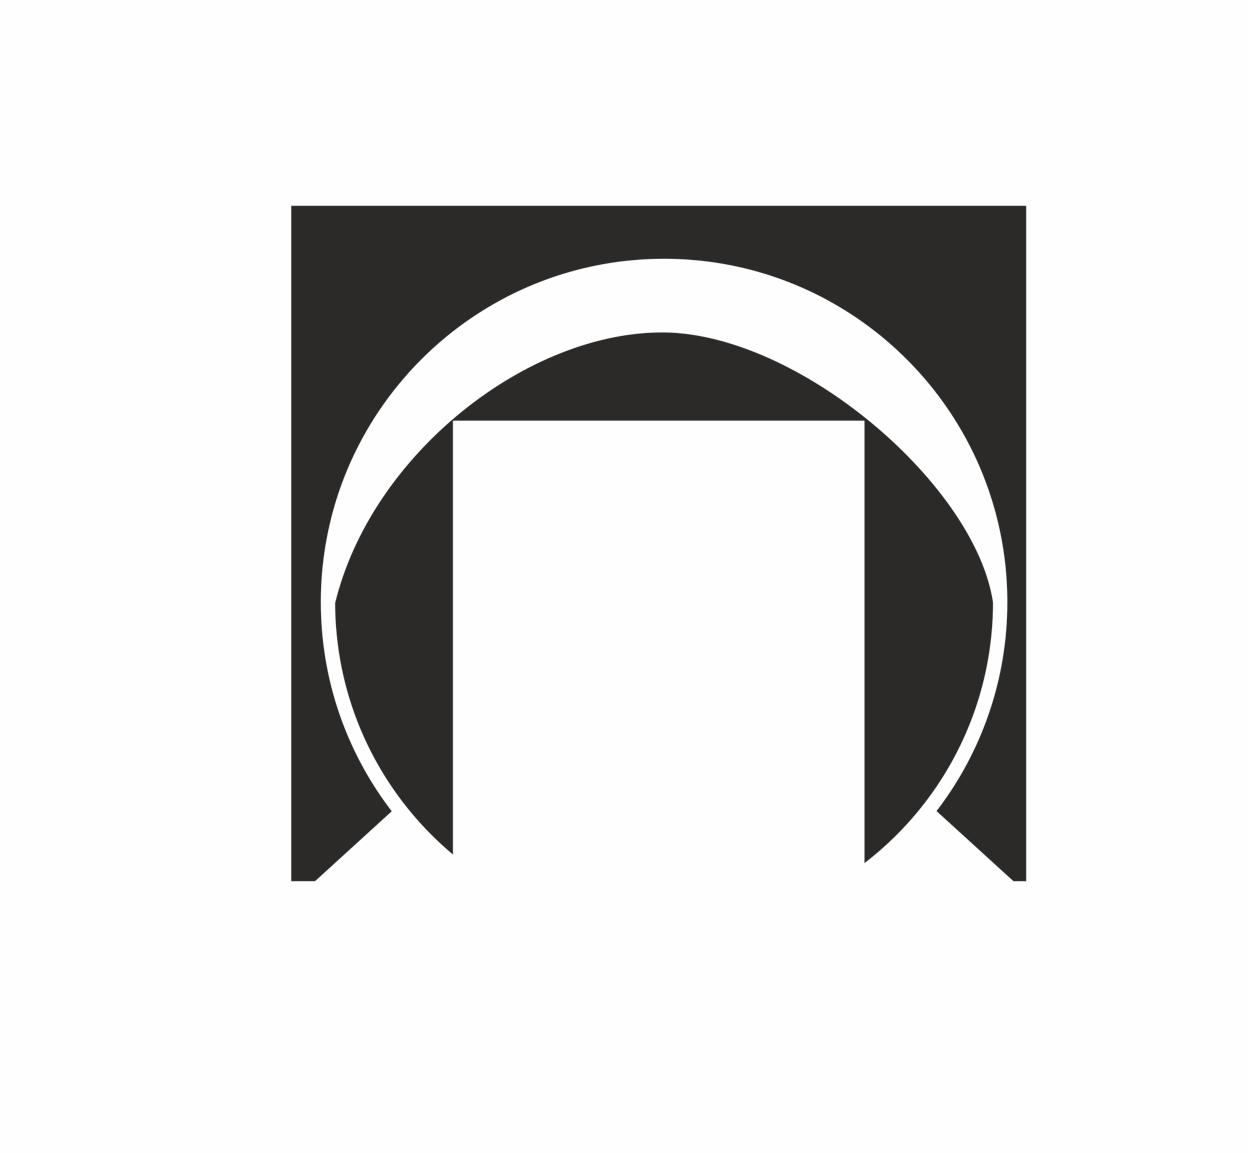 Придумать концепцию логотипа группы компаний фото f_4155b759b4c5ec3e.jpg